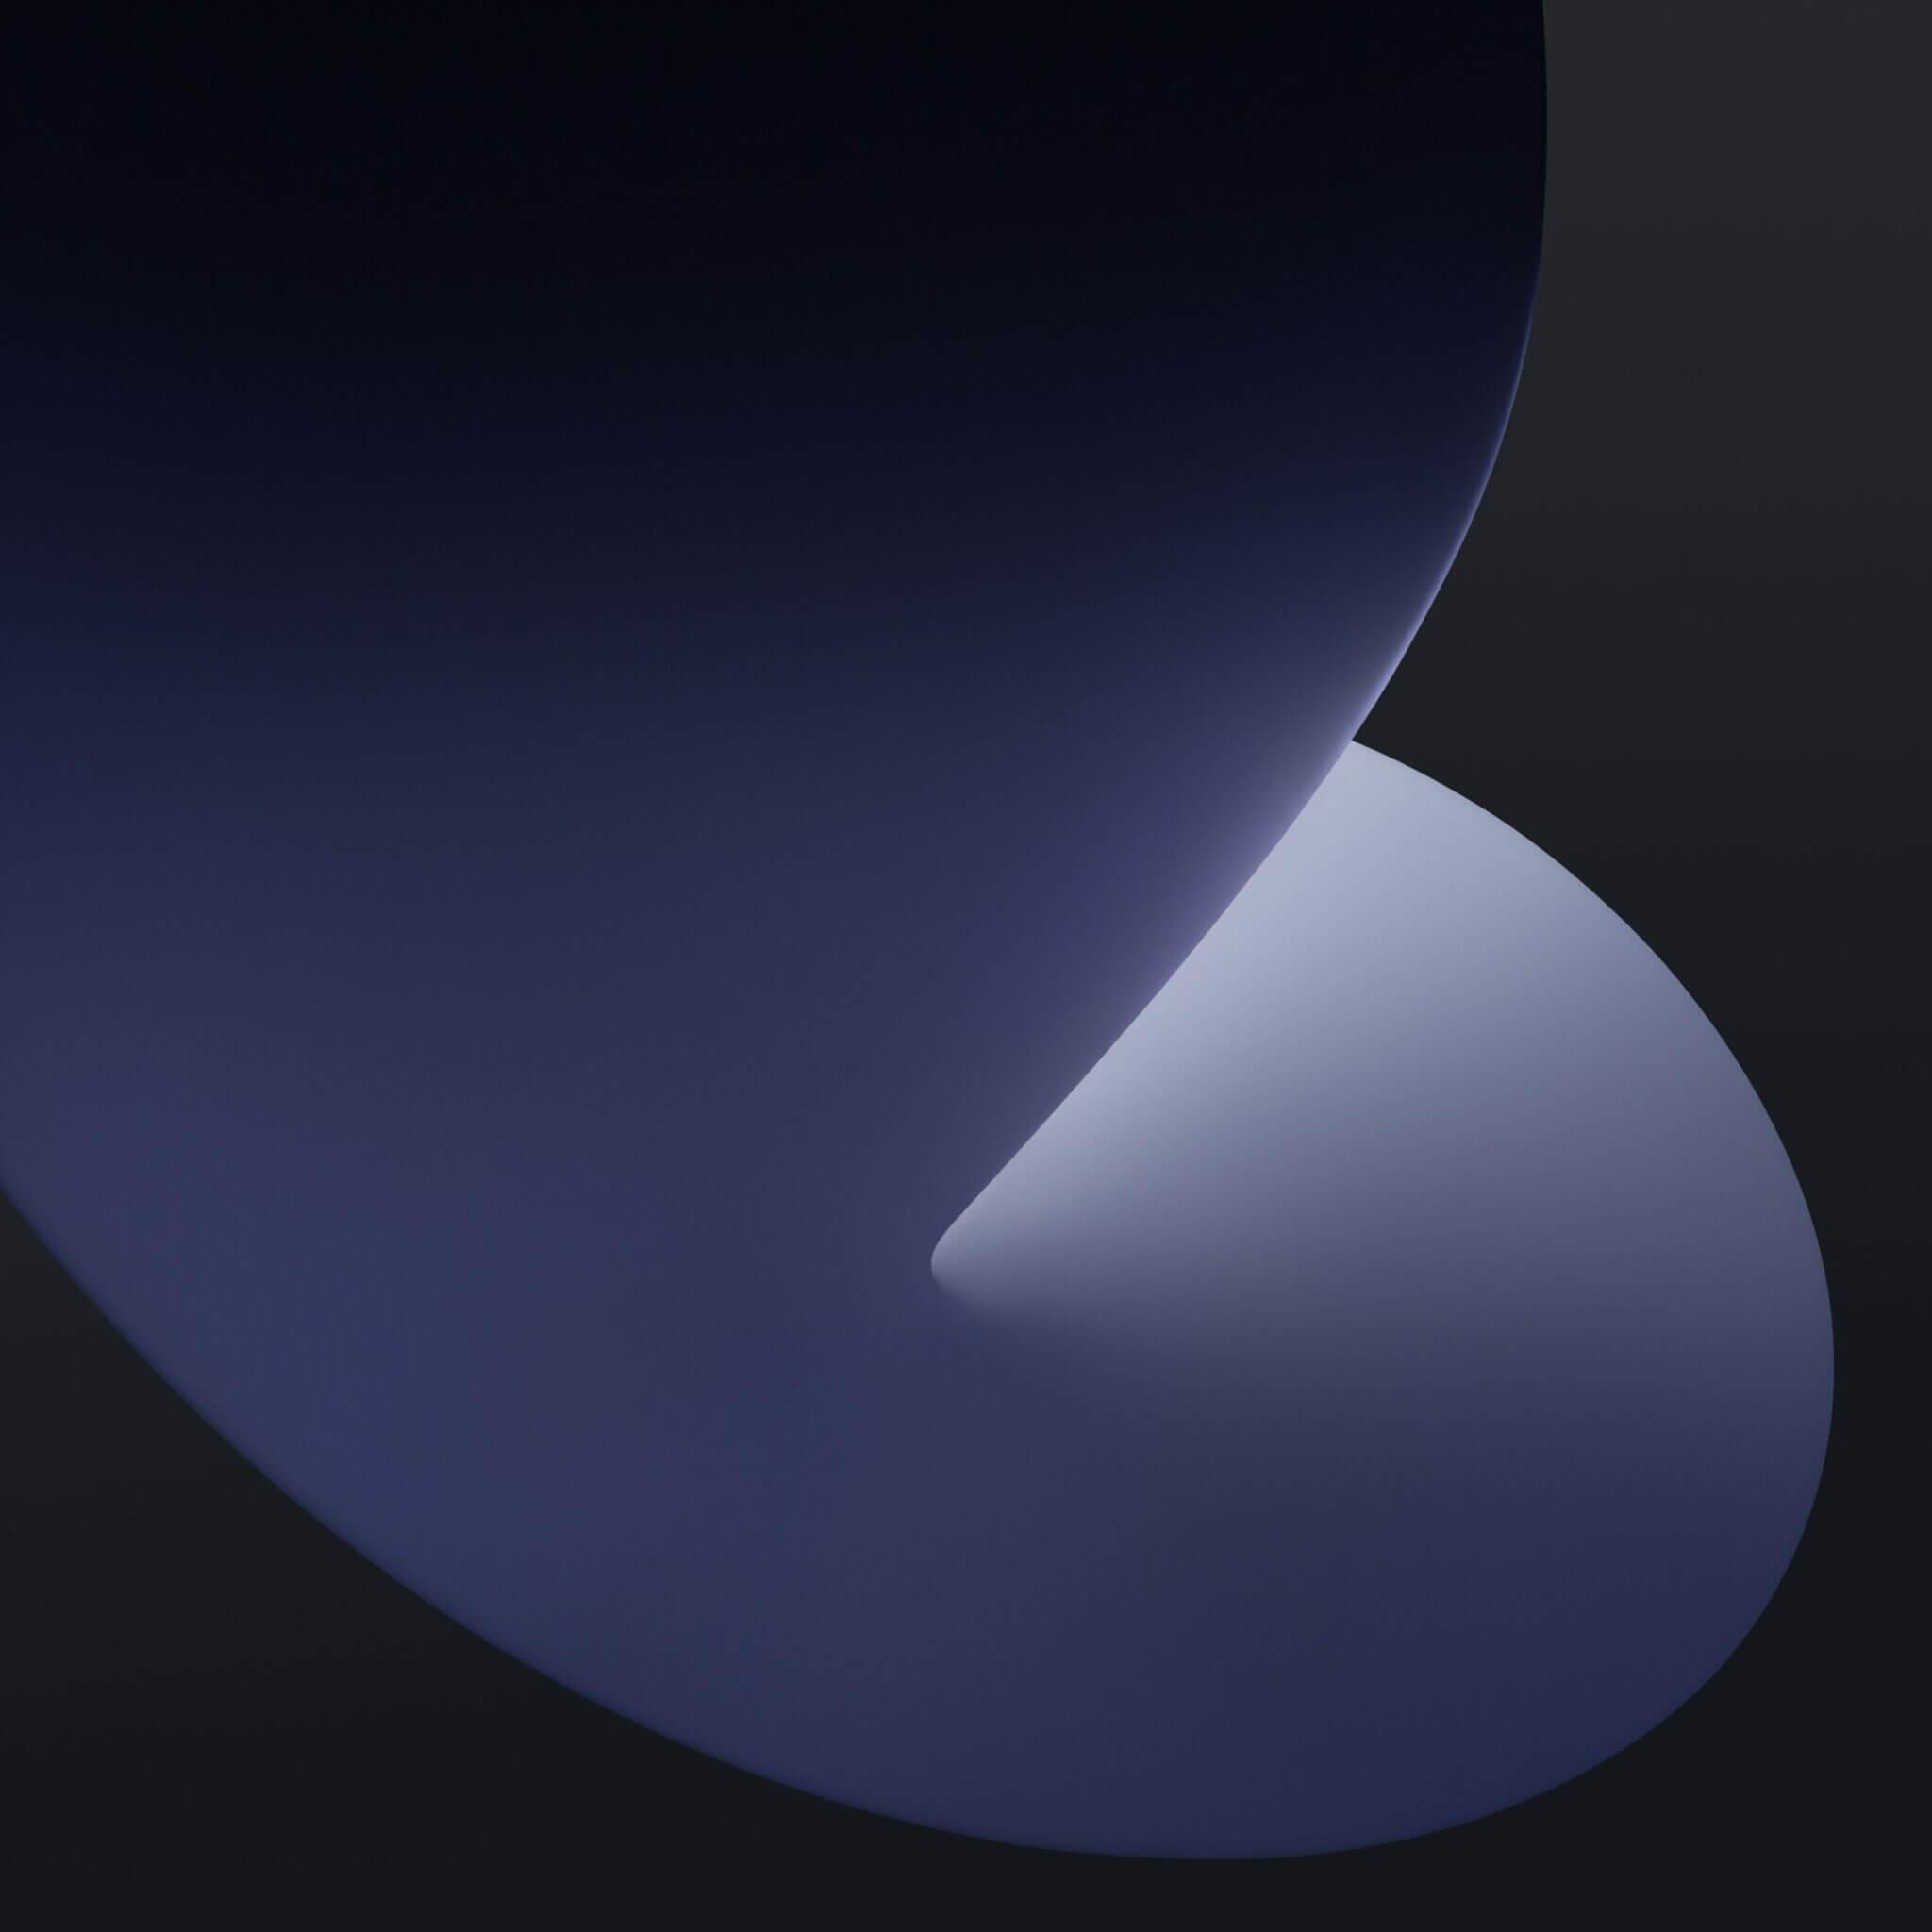 ios 14 wallpaper ispazio dark mode 3